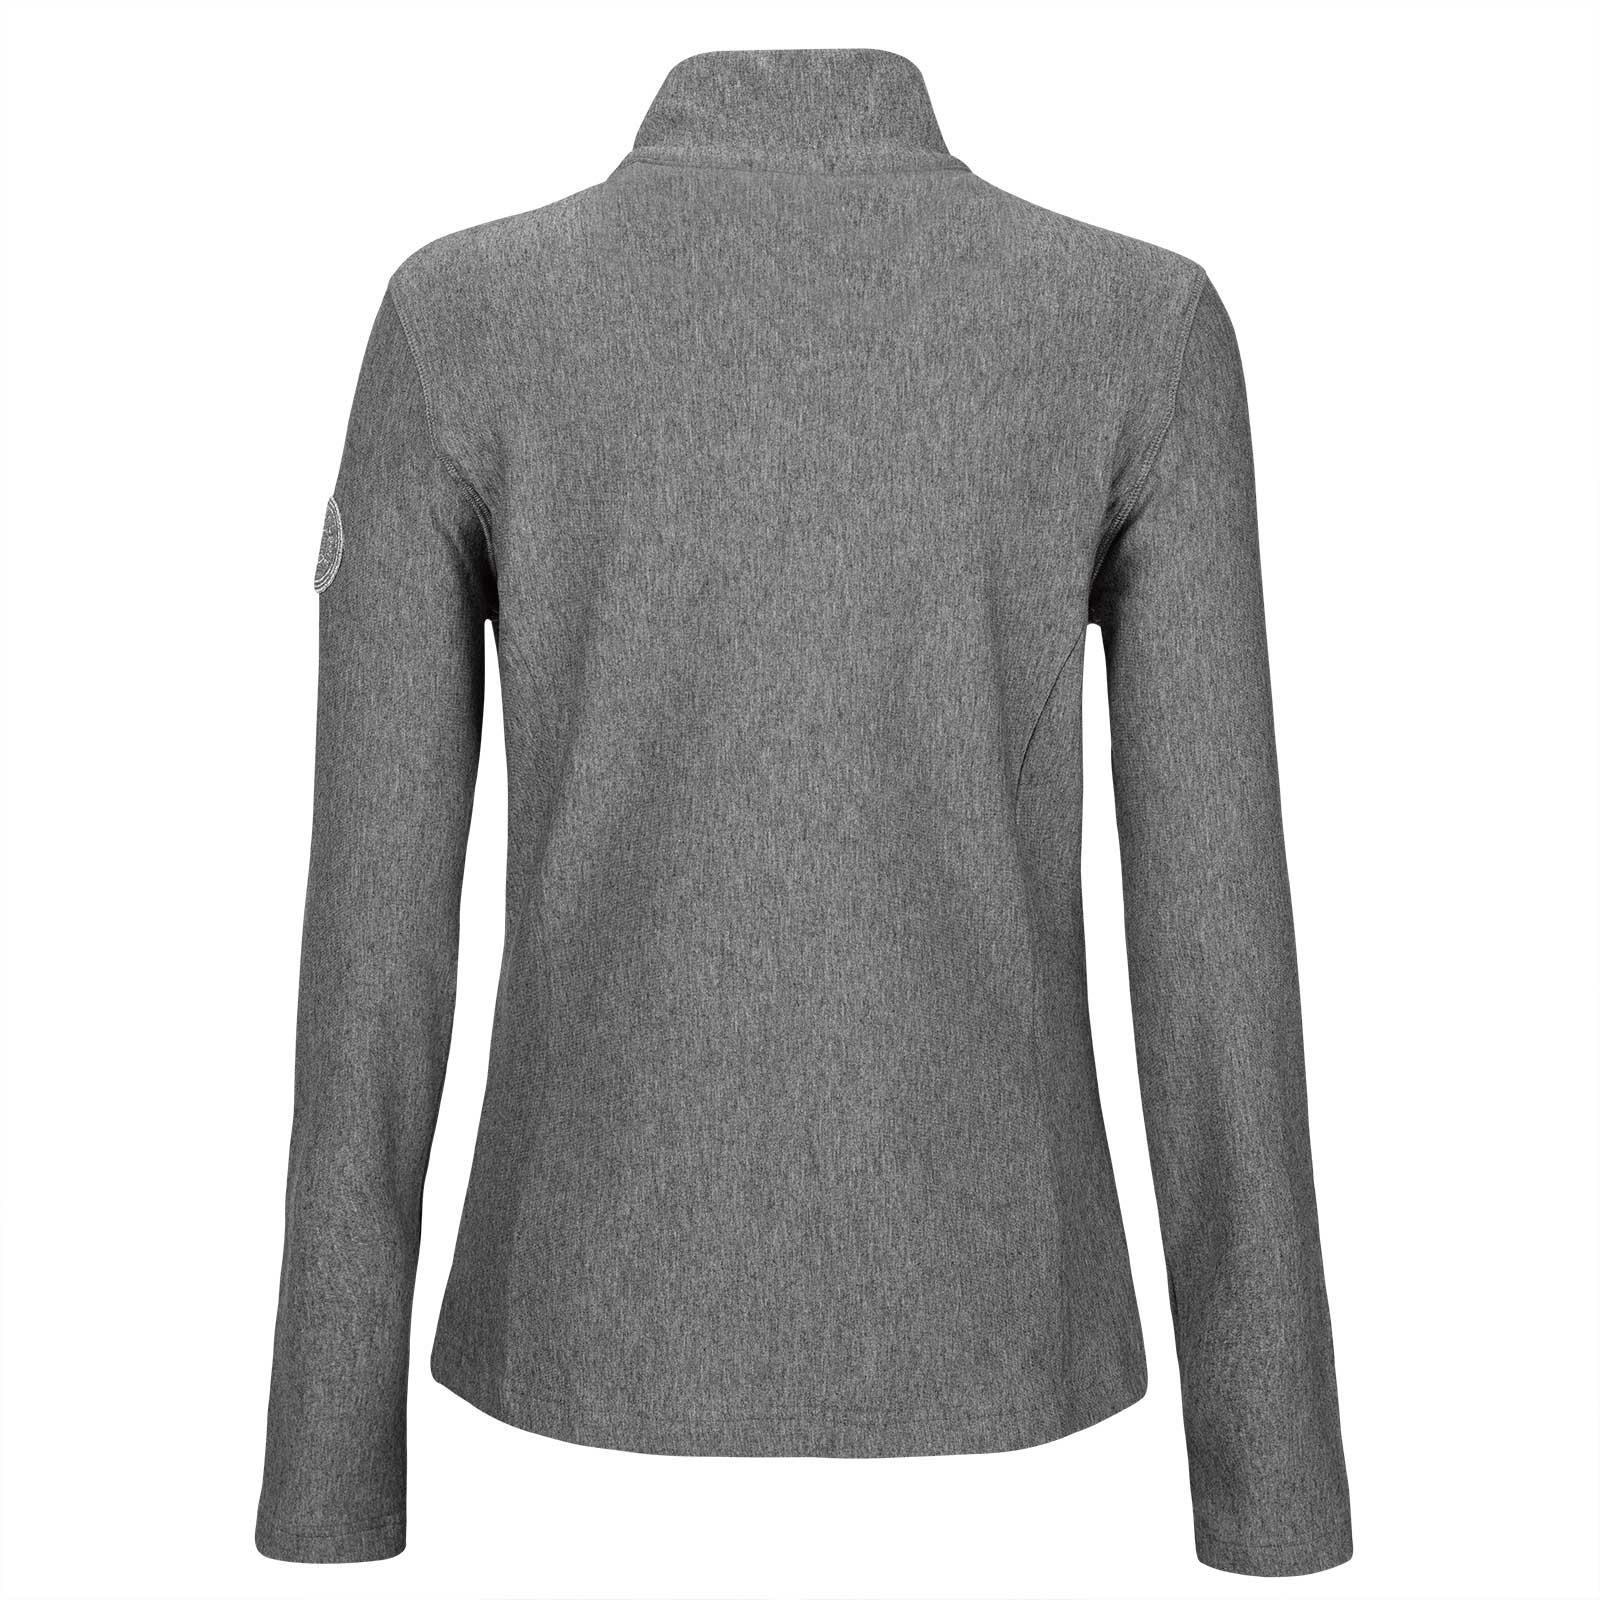 Damen Zip-Jacke mit Cold Protection Funktion